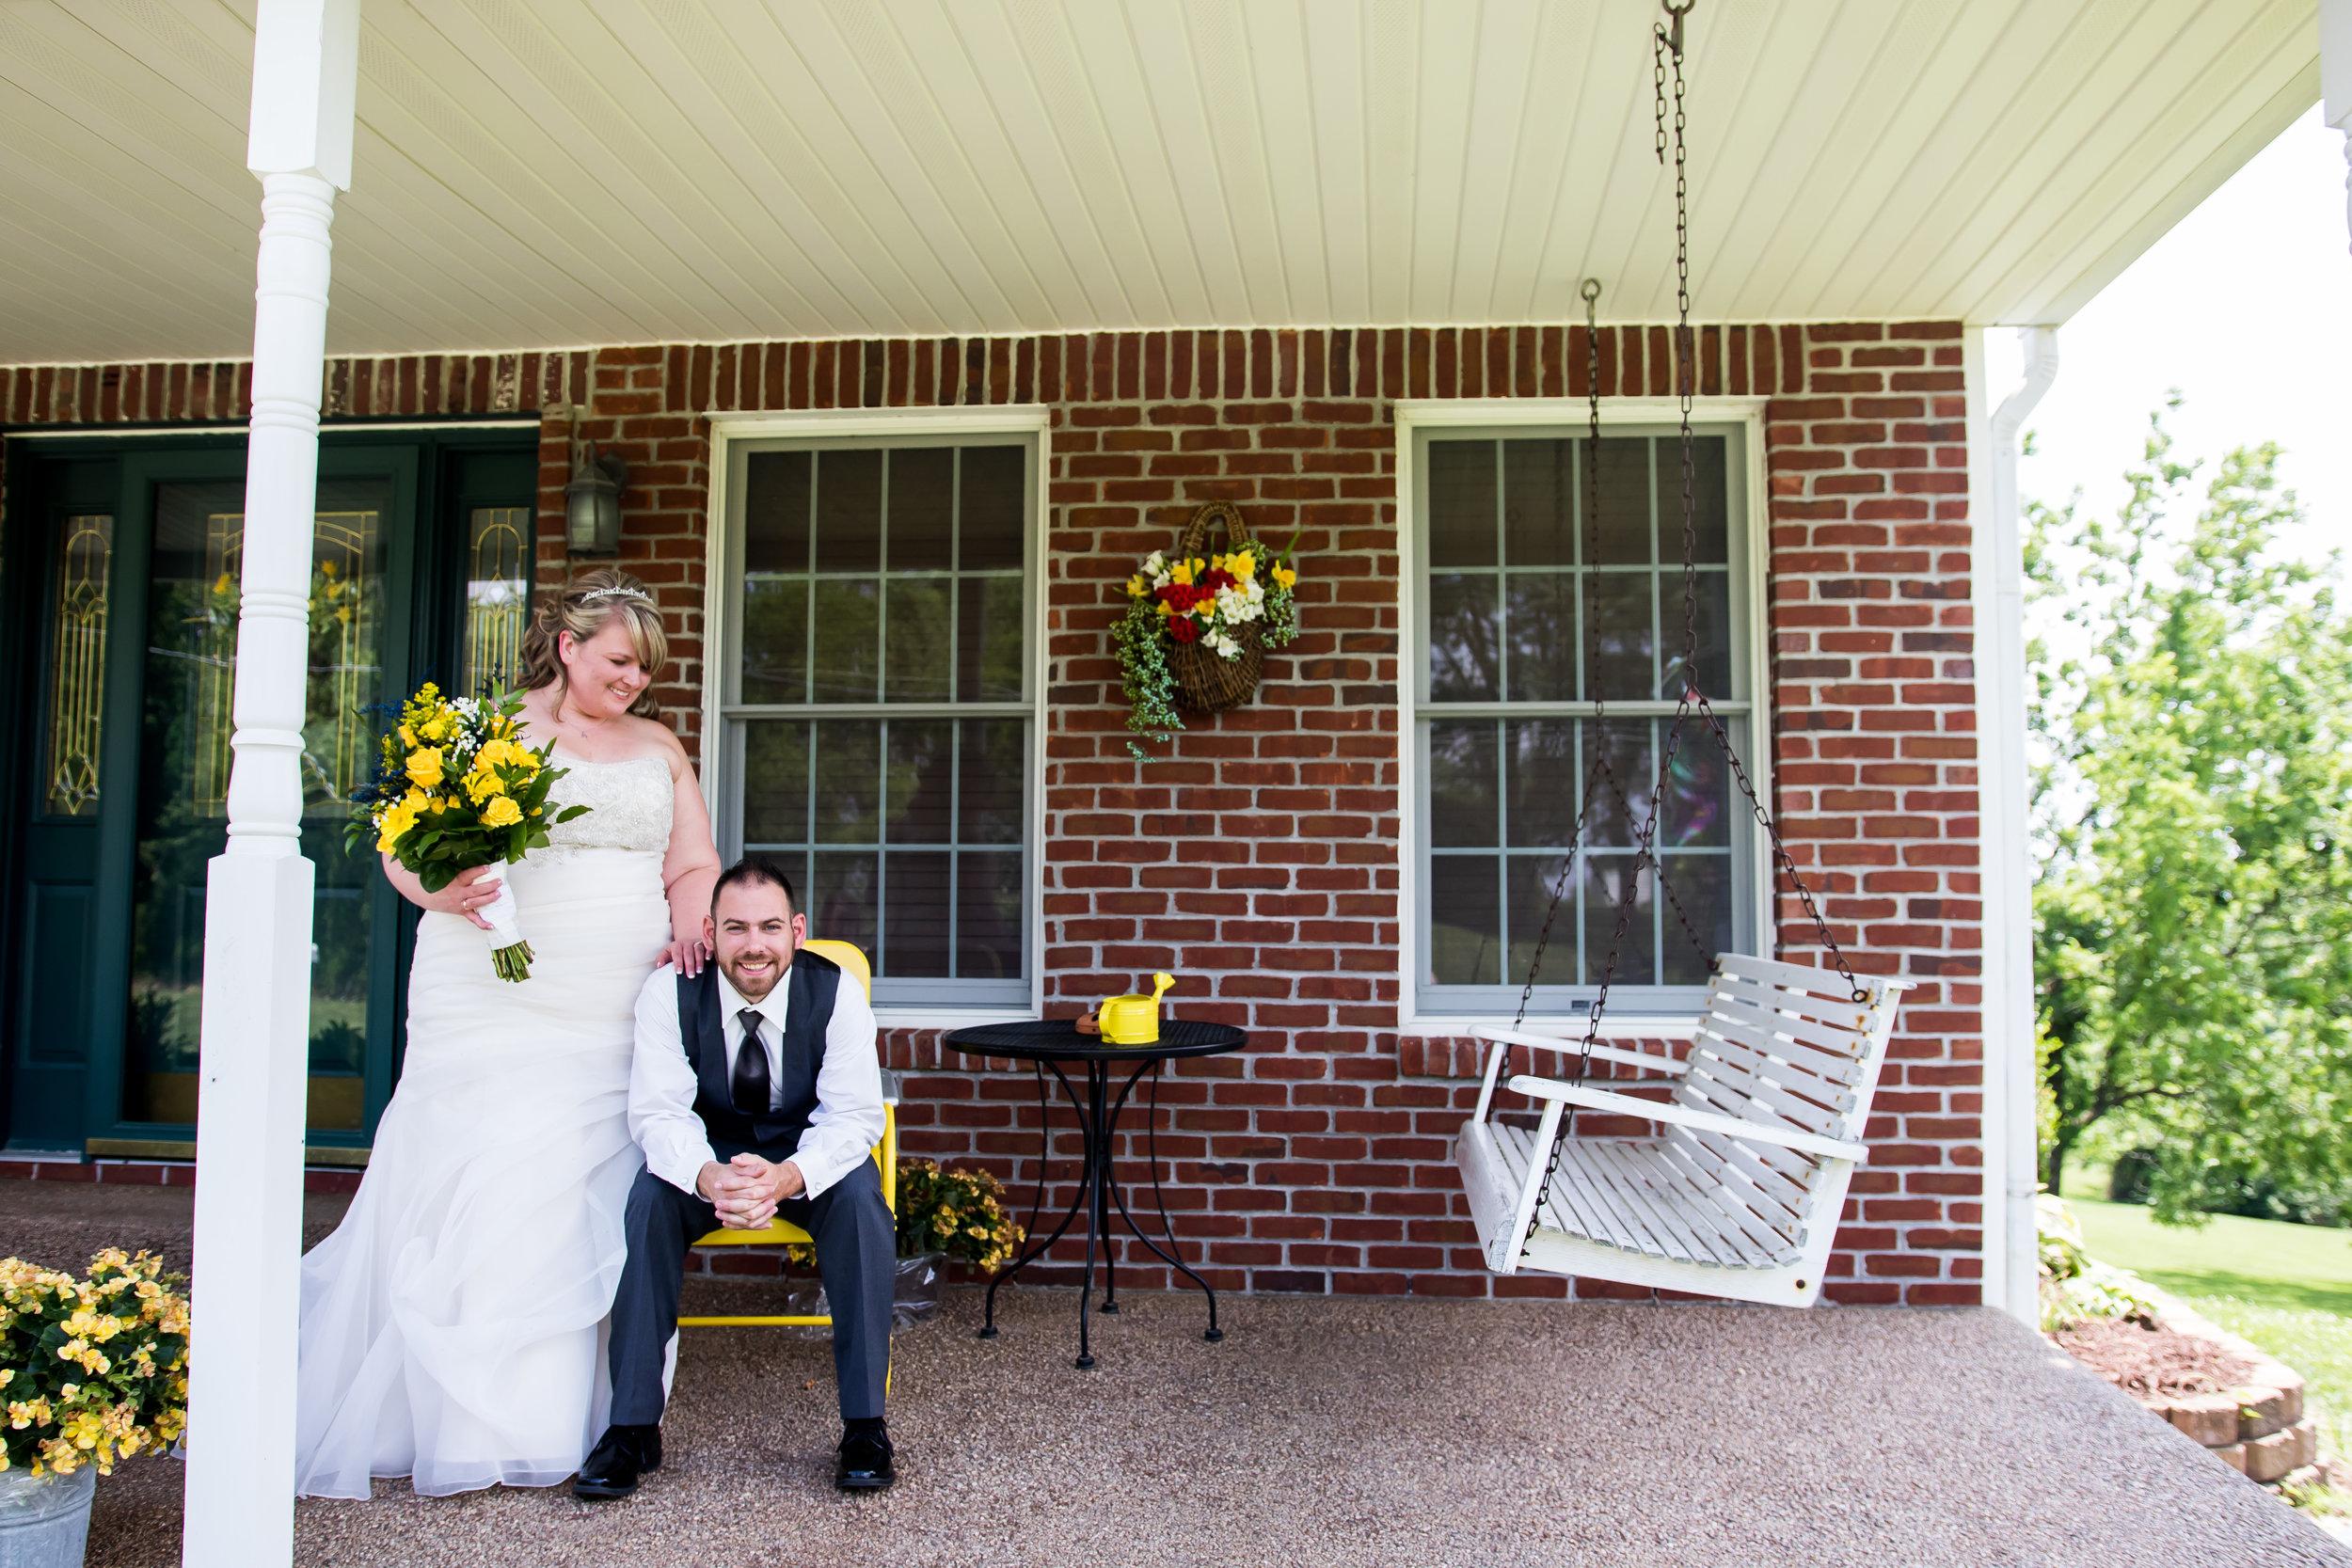 Wedding_Photography_Ward-505.jpg